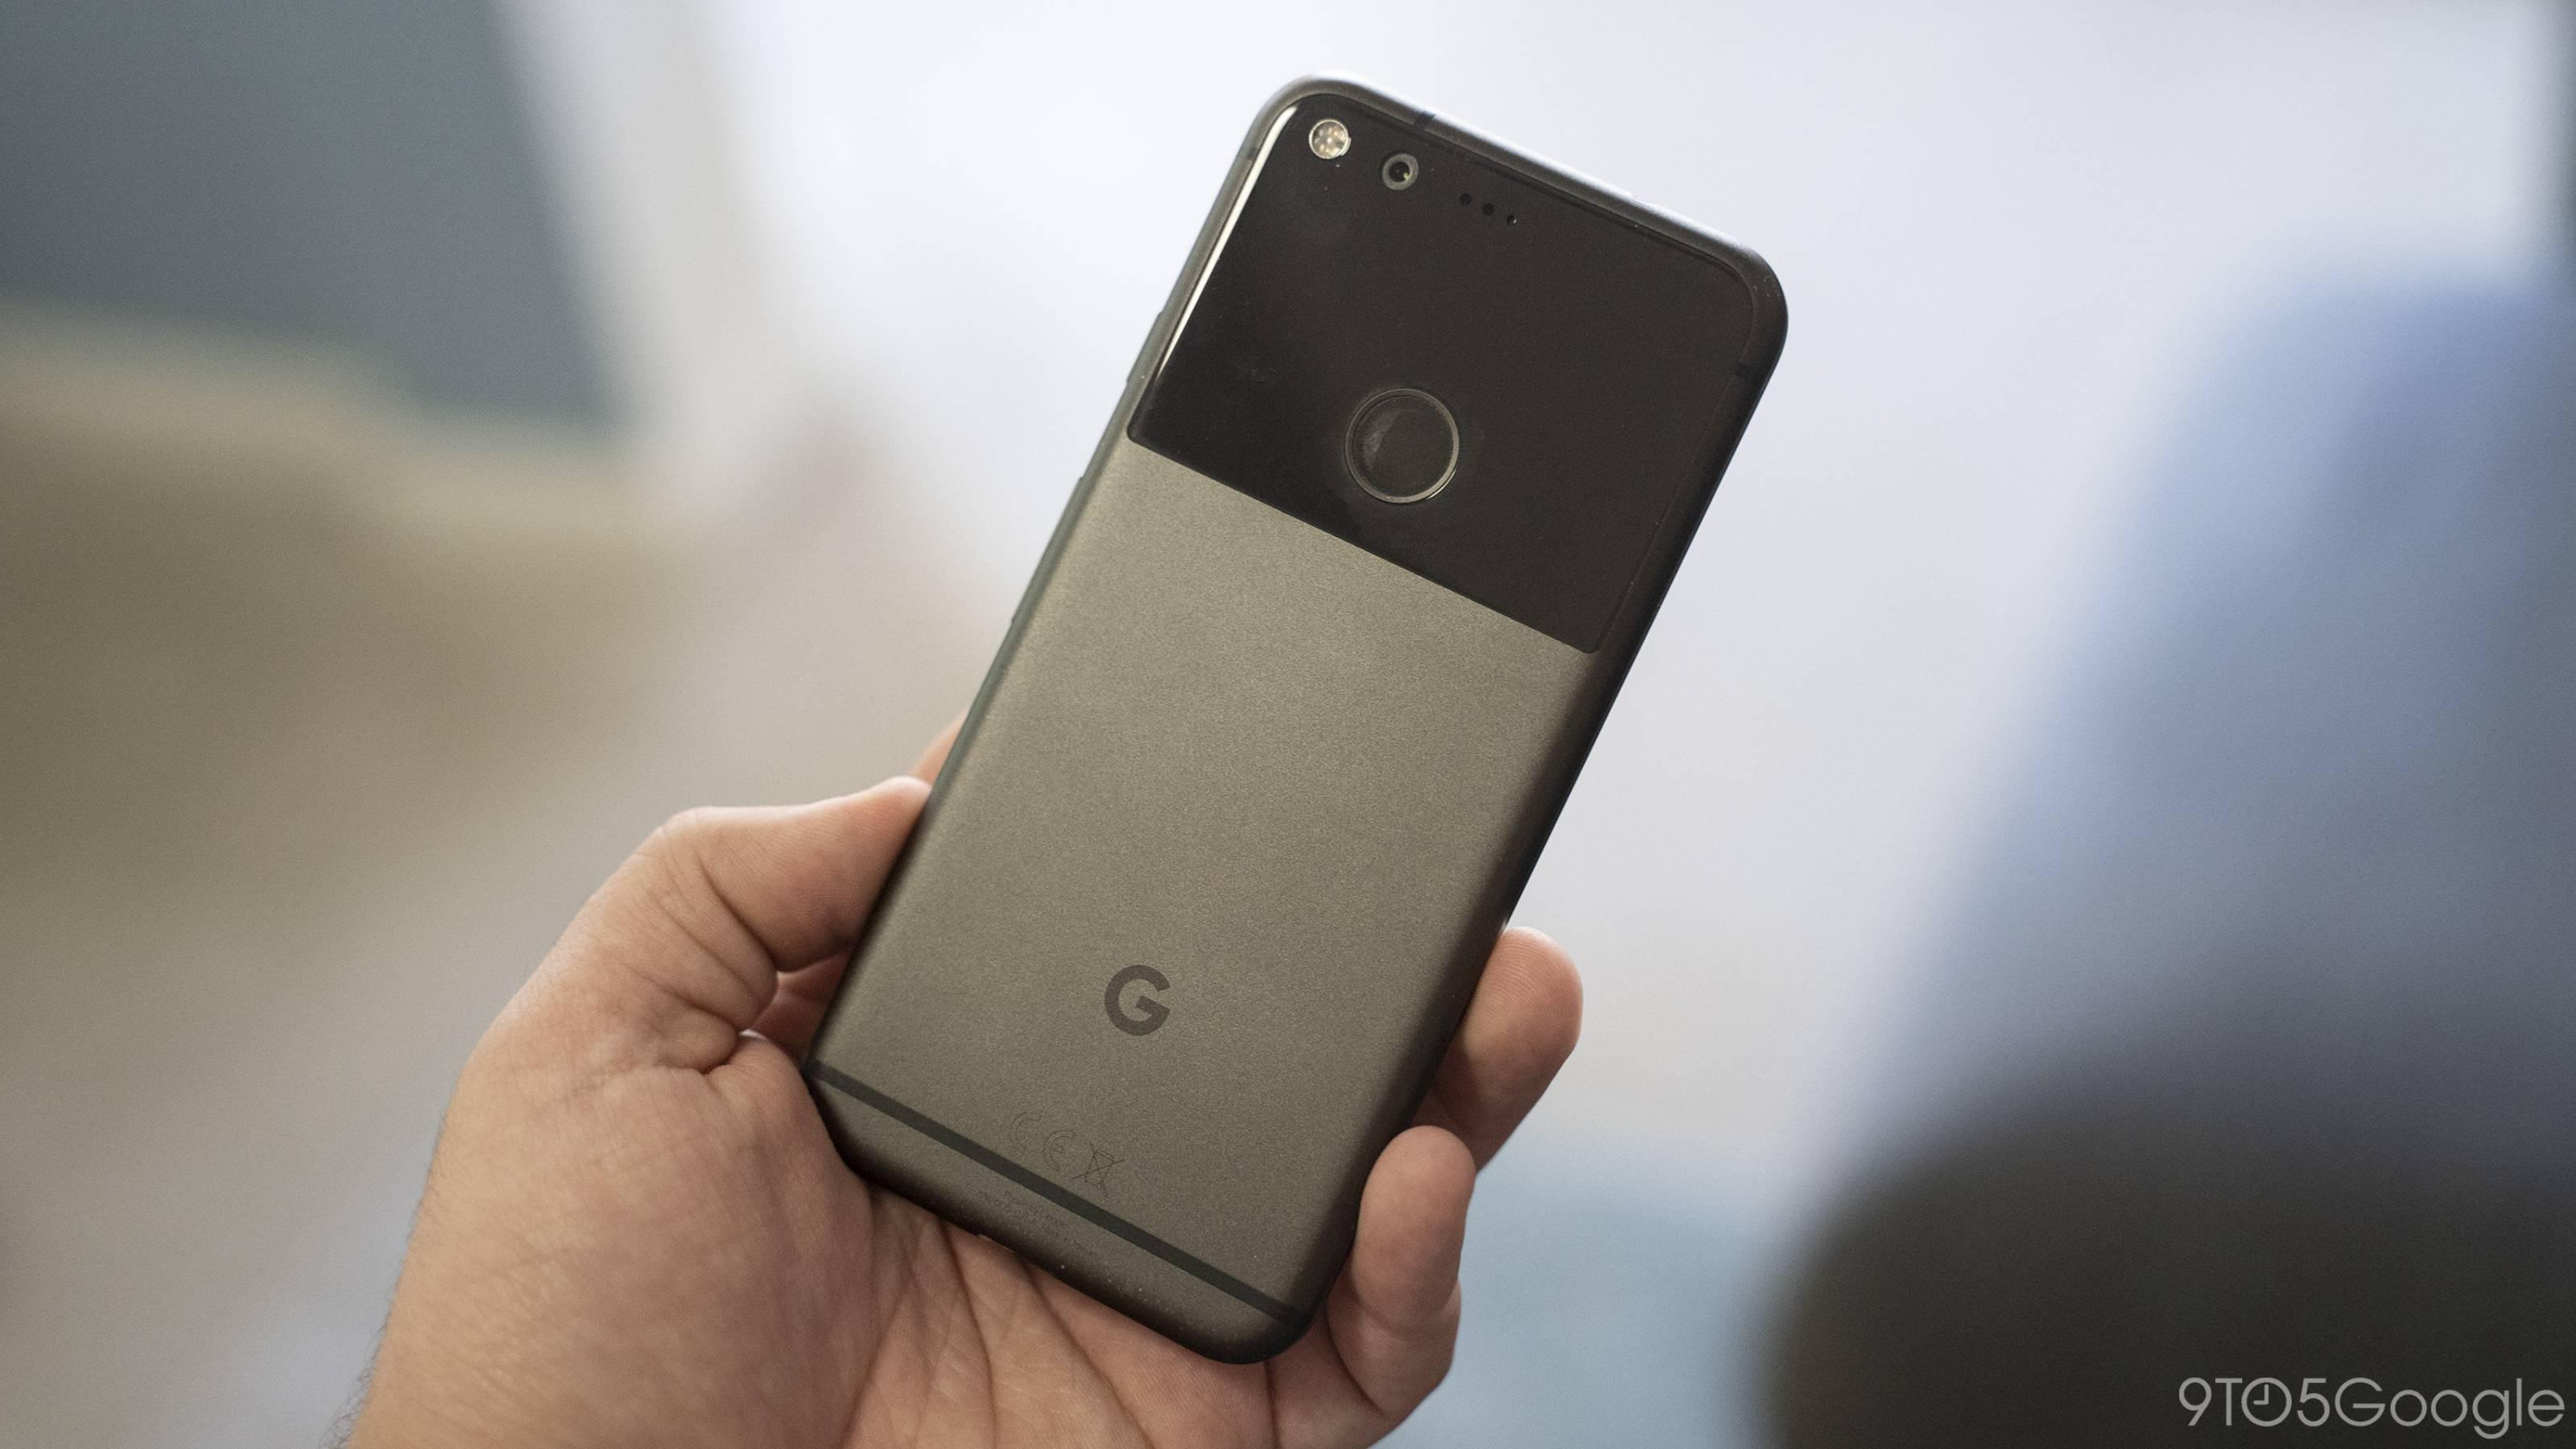 google pixel 2016 2 1 jpg?quality=82&strip=all.'